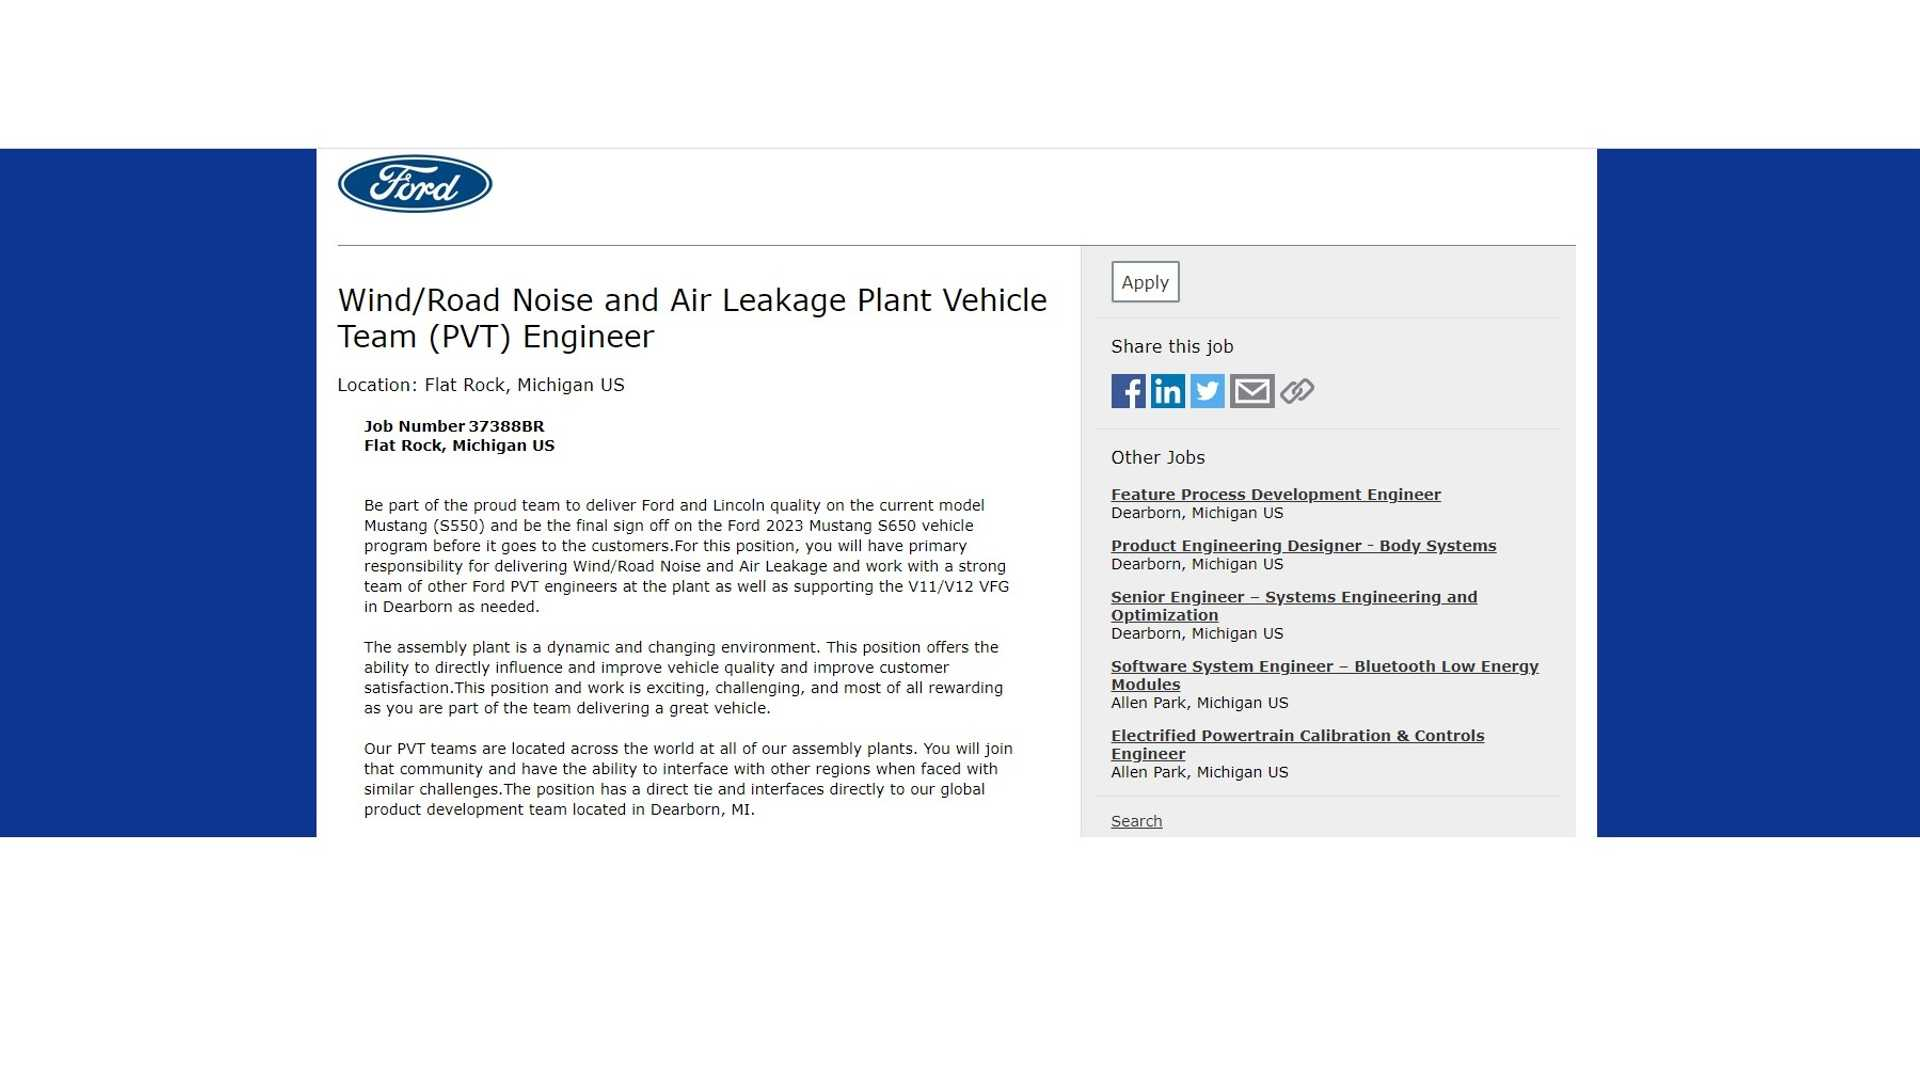 Ford_job_ad_confirming-2023_Mustang_0001